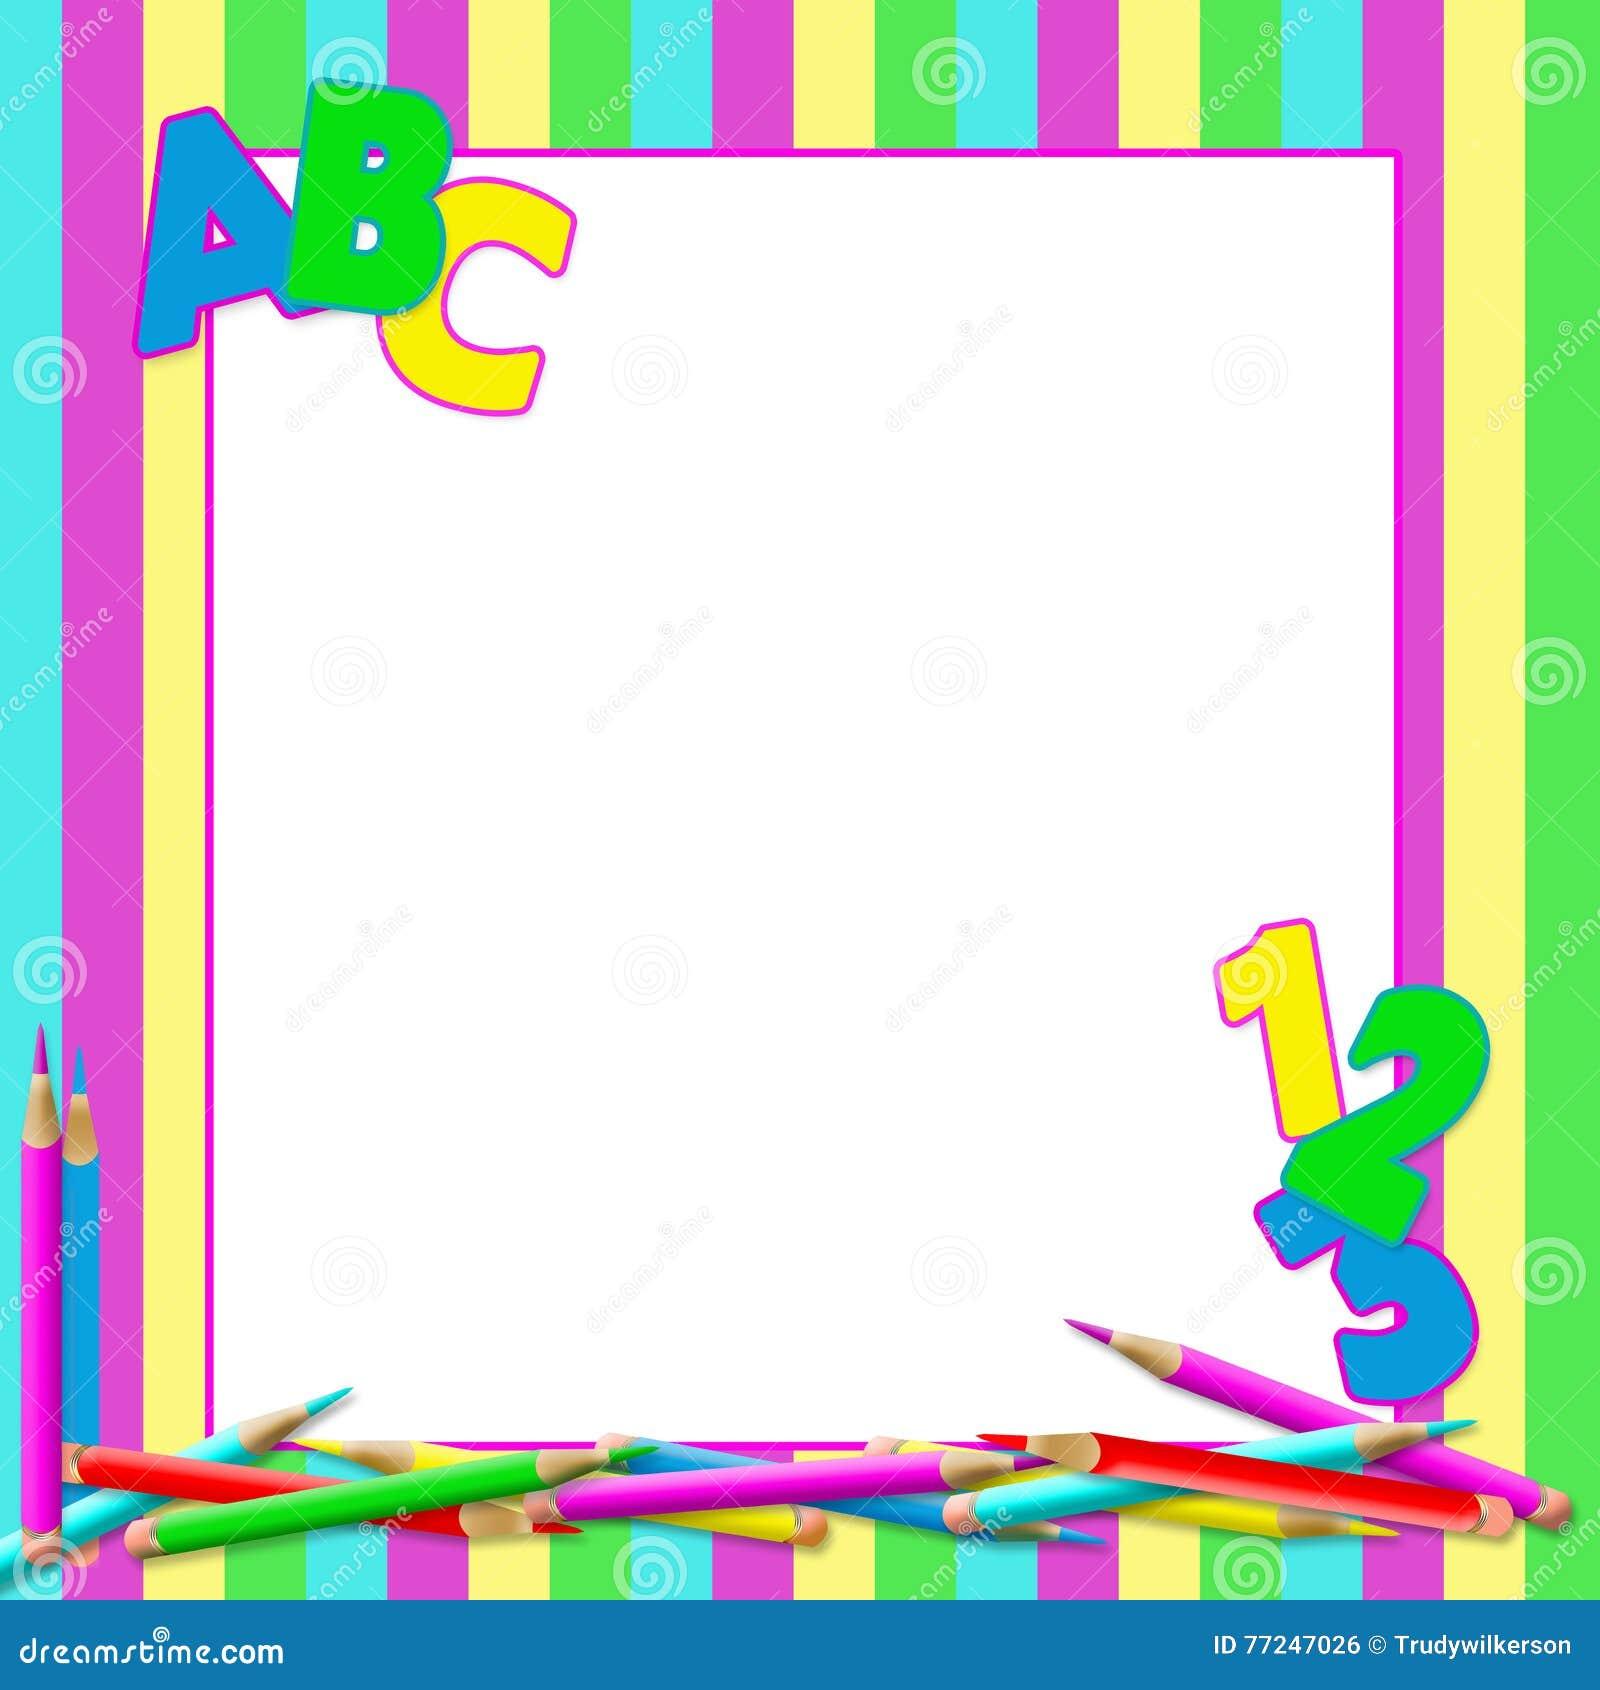 abc school bright background stock illustration